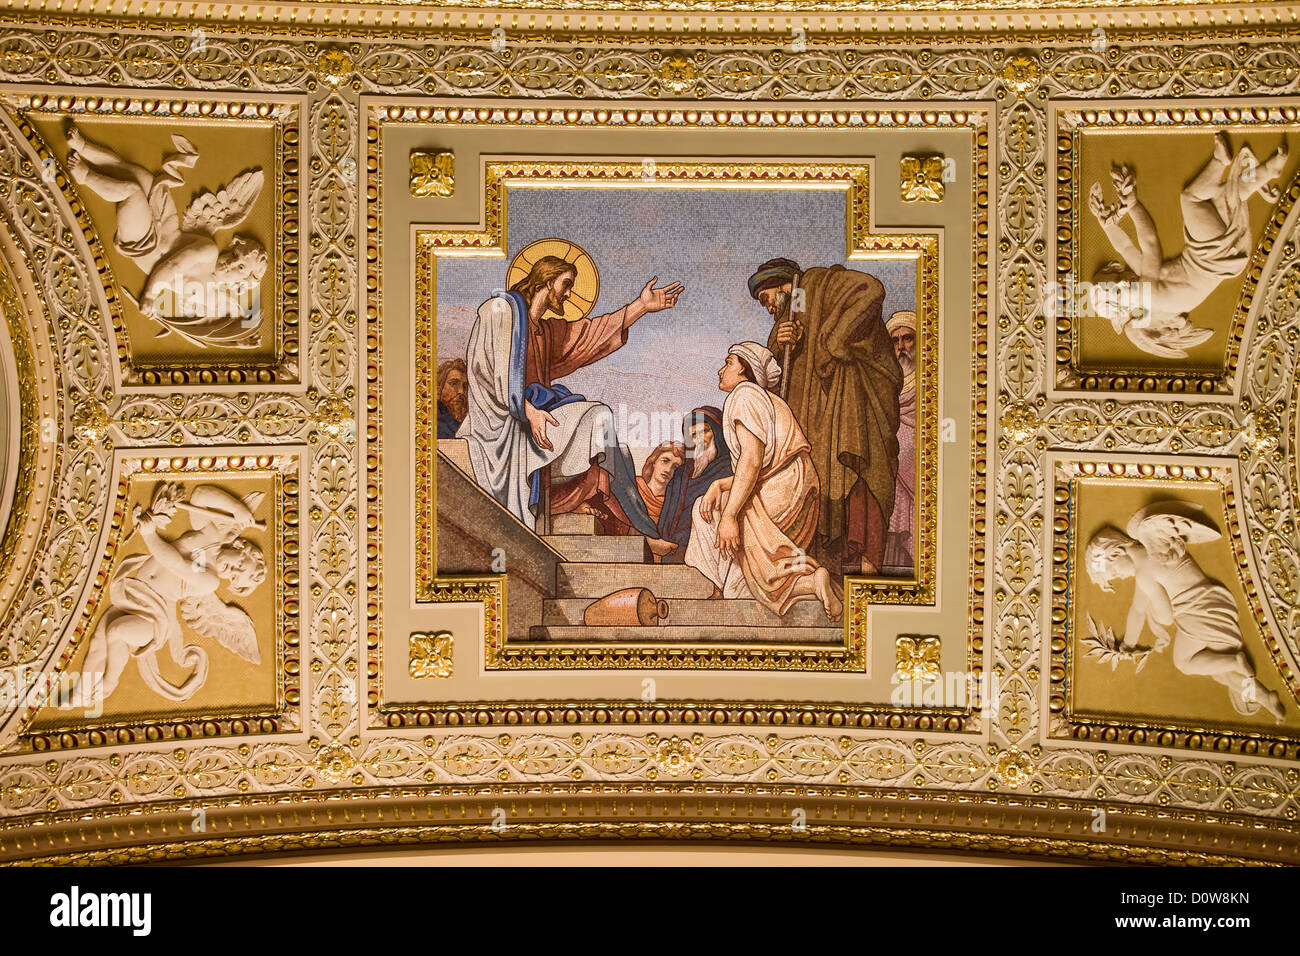 Jesus Christ mosaic in the St Stephen Basilica, Budapest, Hungary. Stock Photo